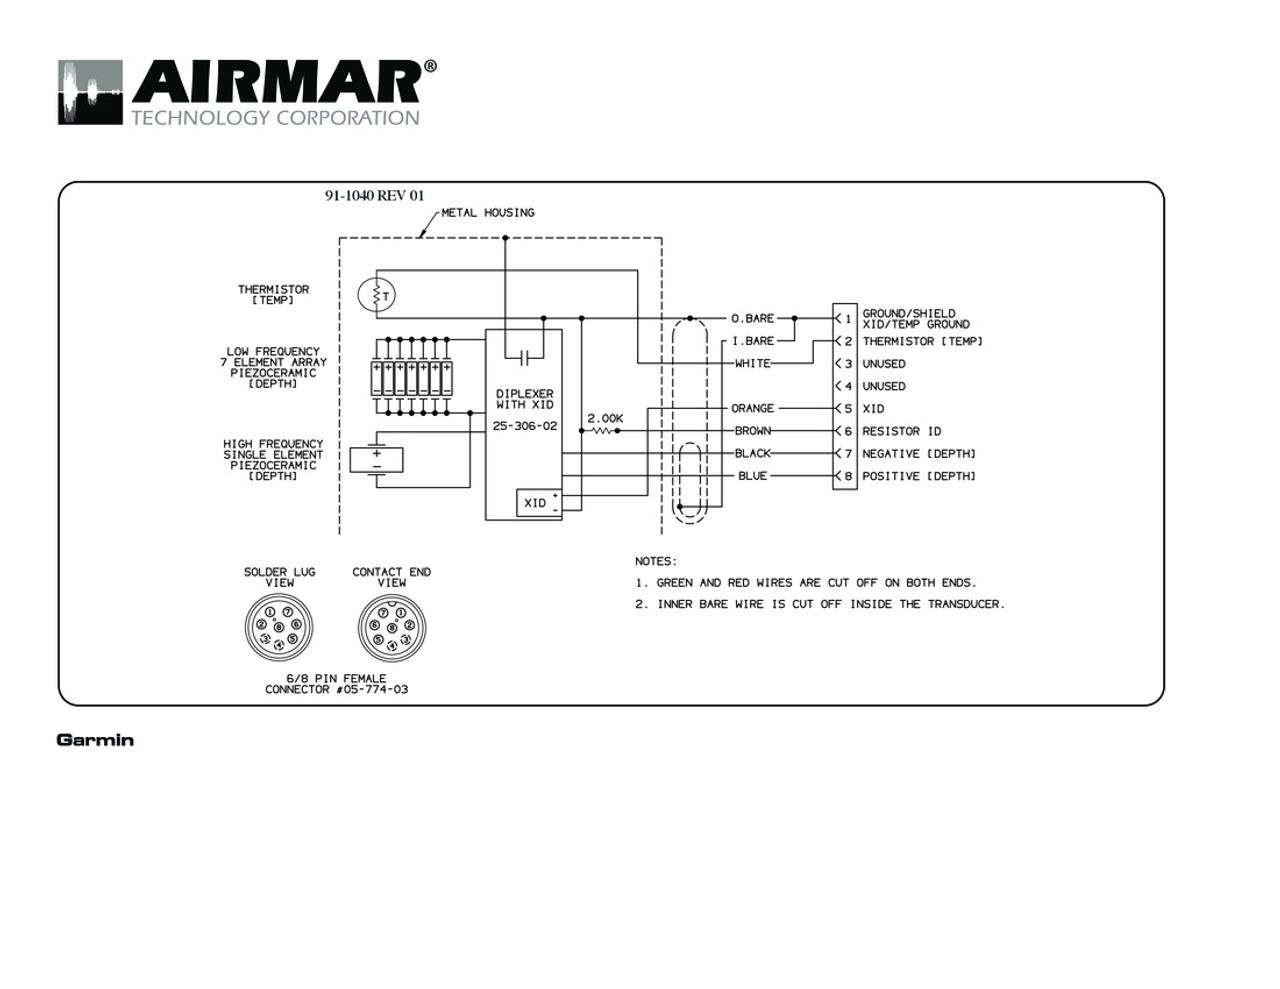 small resolution of garmin 196 gp wiring diagram